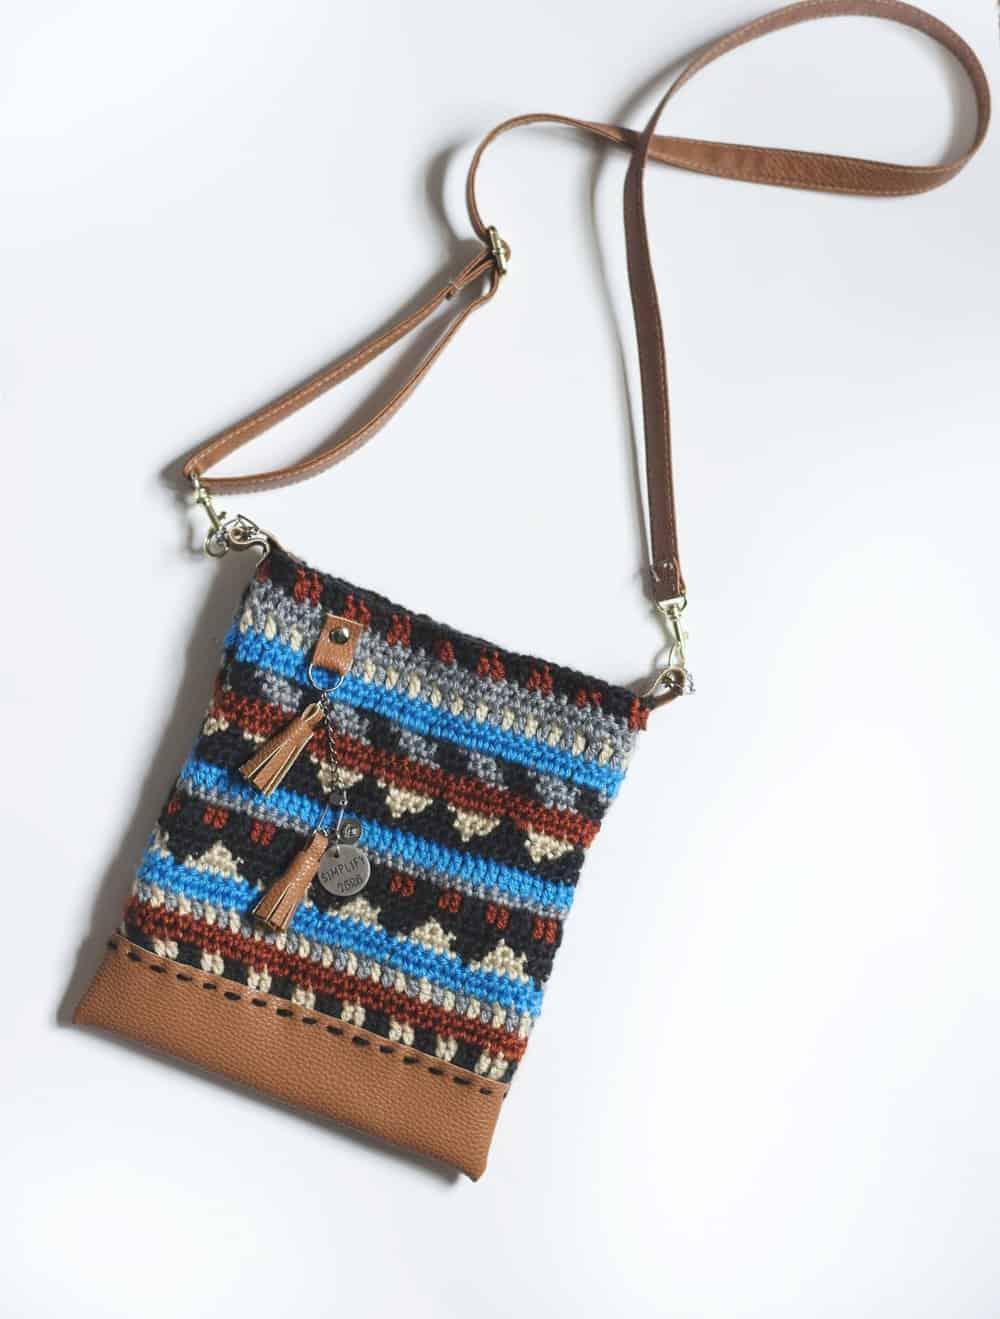 Aztec cross-body boho purse